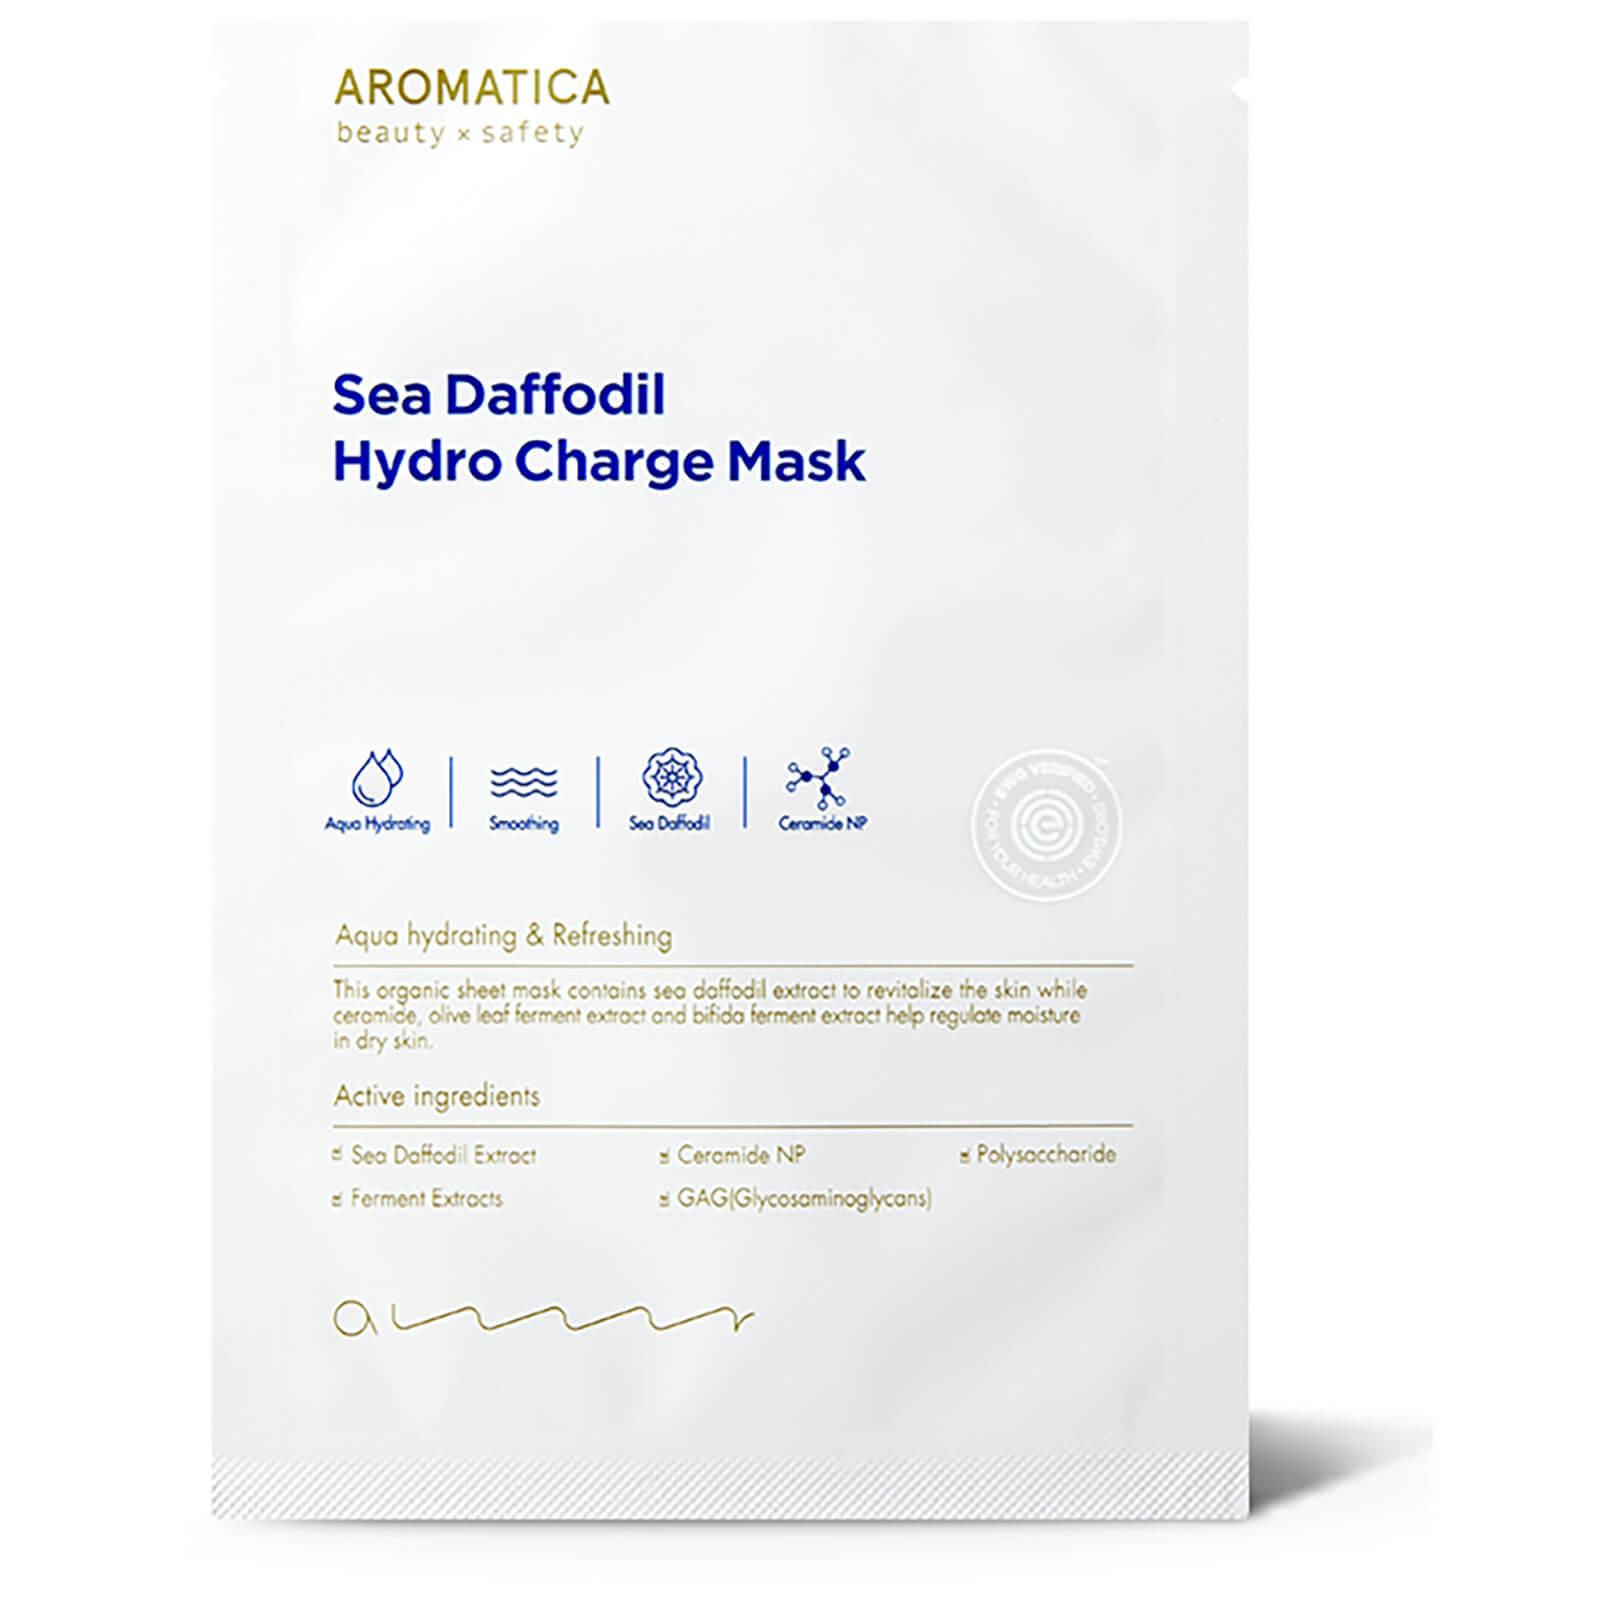 Увлажняющая маска для лица AROMATICA Sea Daffodil Hydro Charge Mask (1 шт.)  - Купить